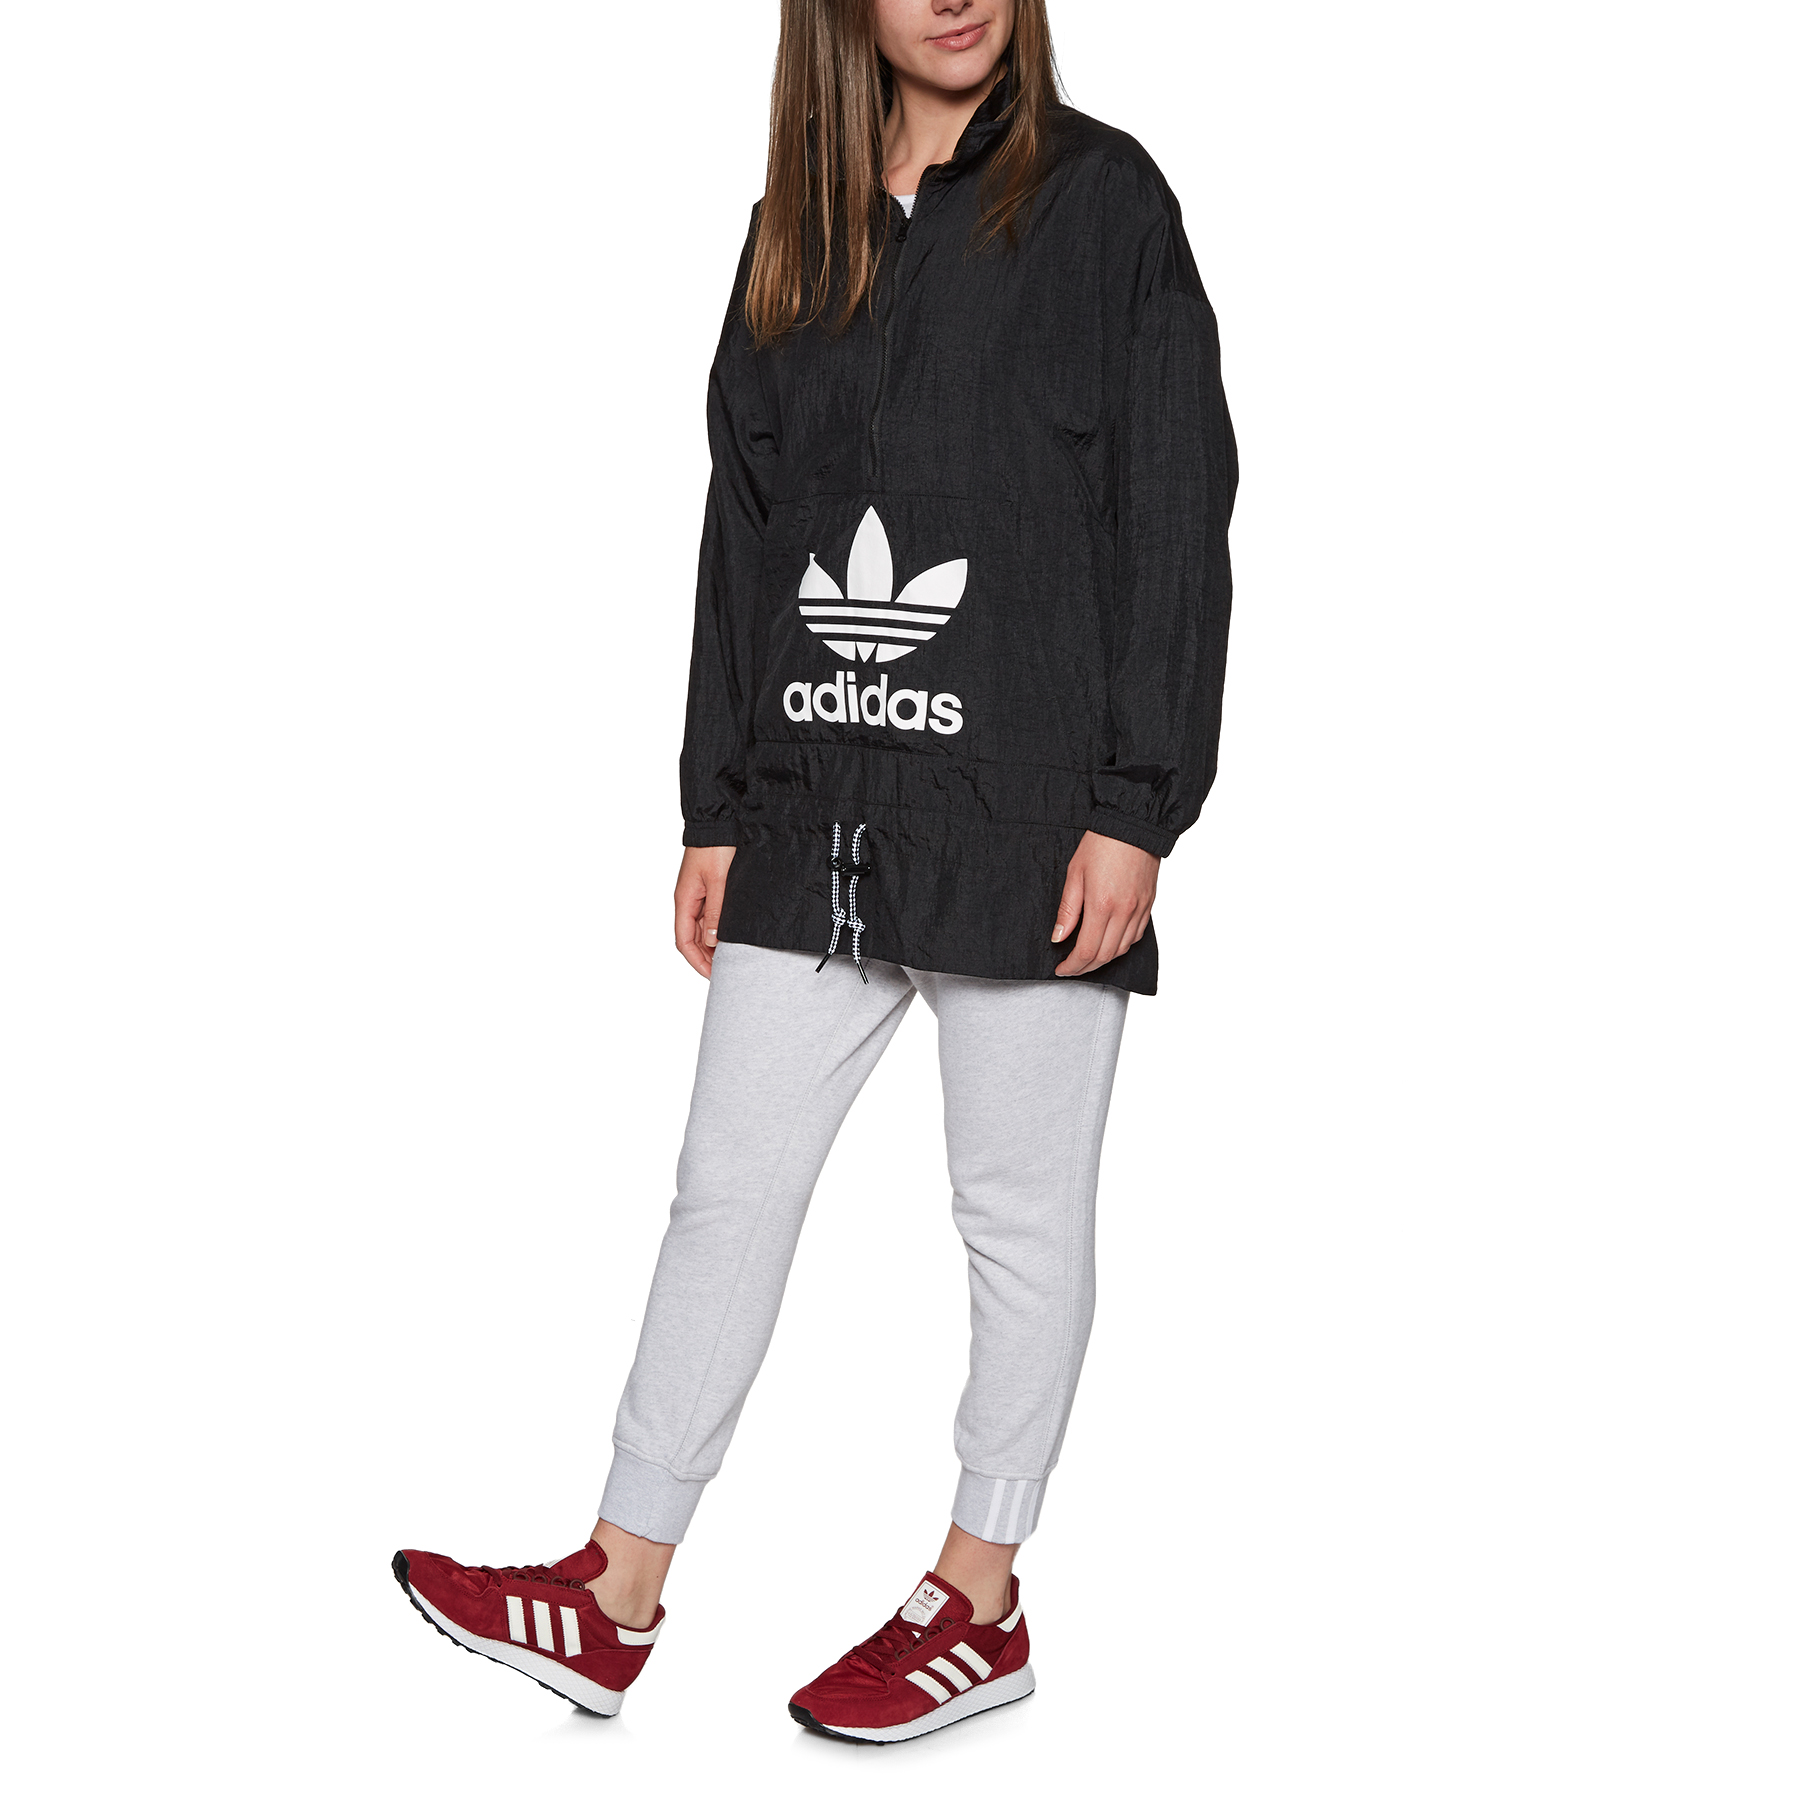 Adidas Womens JacketFree Originals Windbreaker Windproof rBodCxe